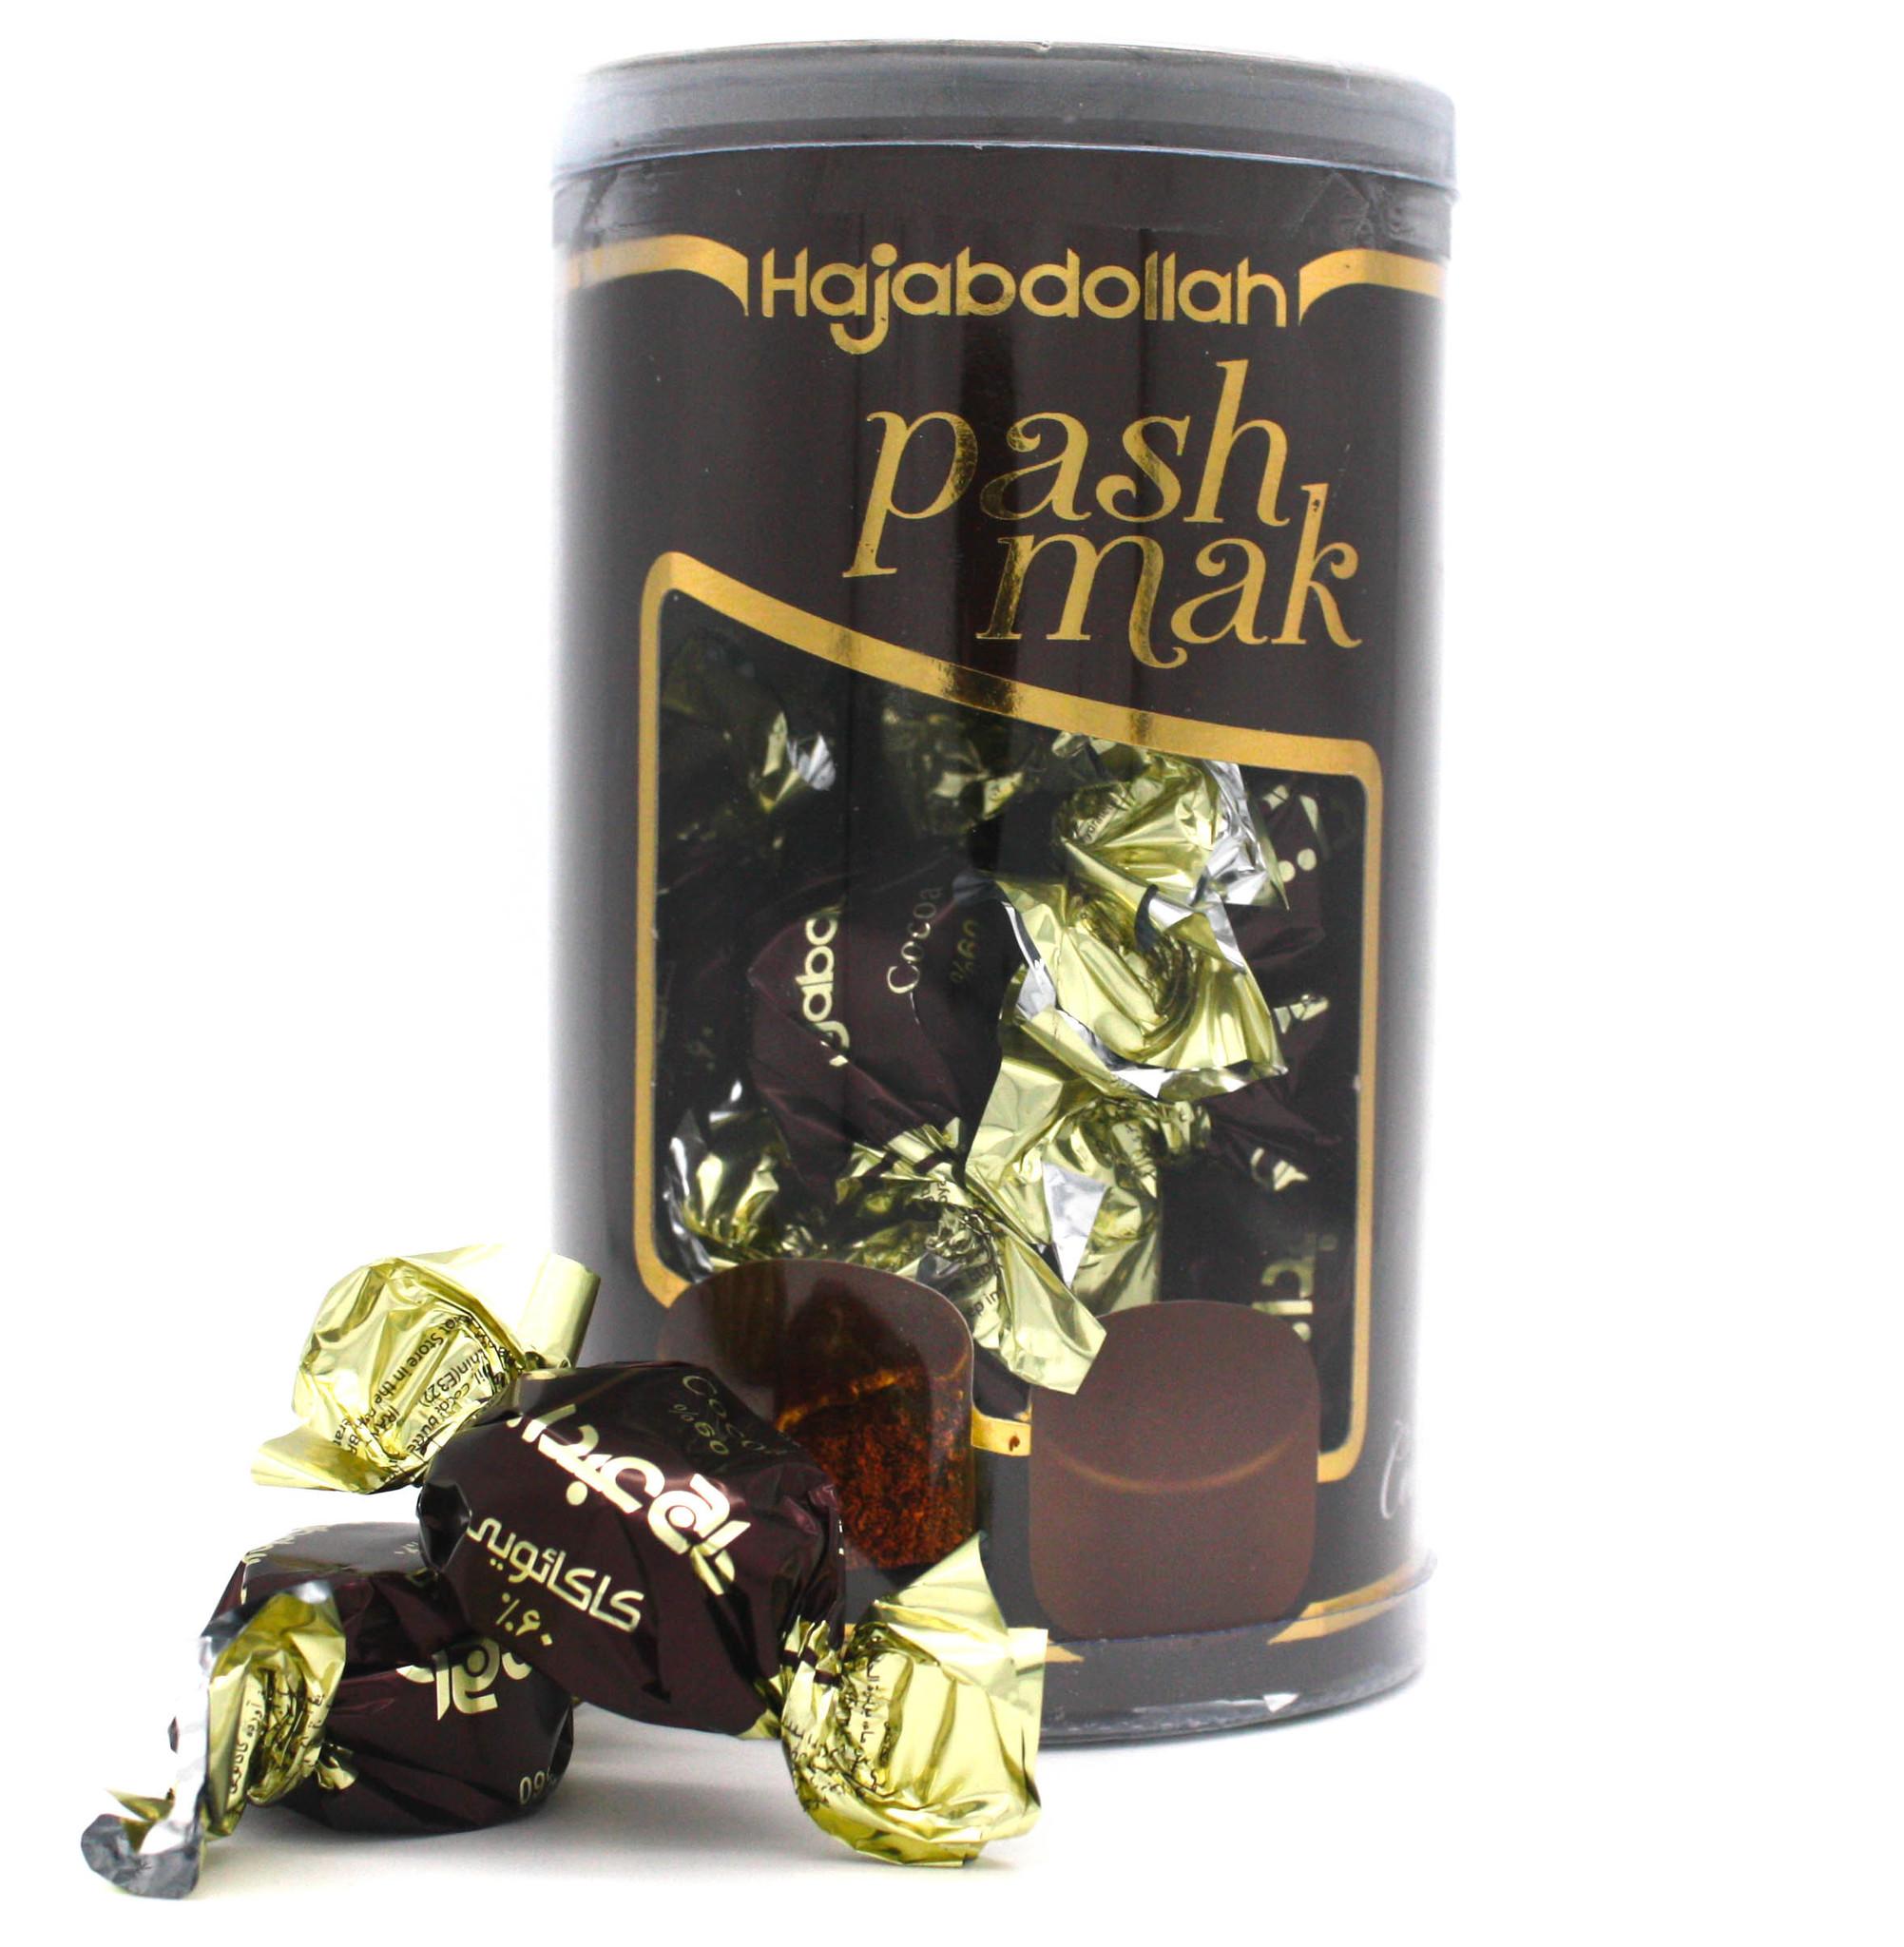 Пишмание со вкусом горького шоколада в шоколадной глазури, Hajabdollah, 200 г import_files_45_450876f52aaa11e9a9a6484d7ecee297_8928833530f111e9a9a6484d7ecee297.jpg